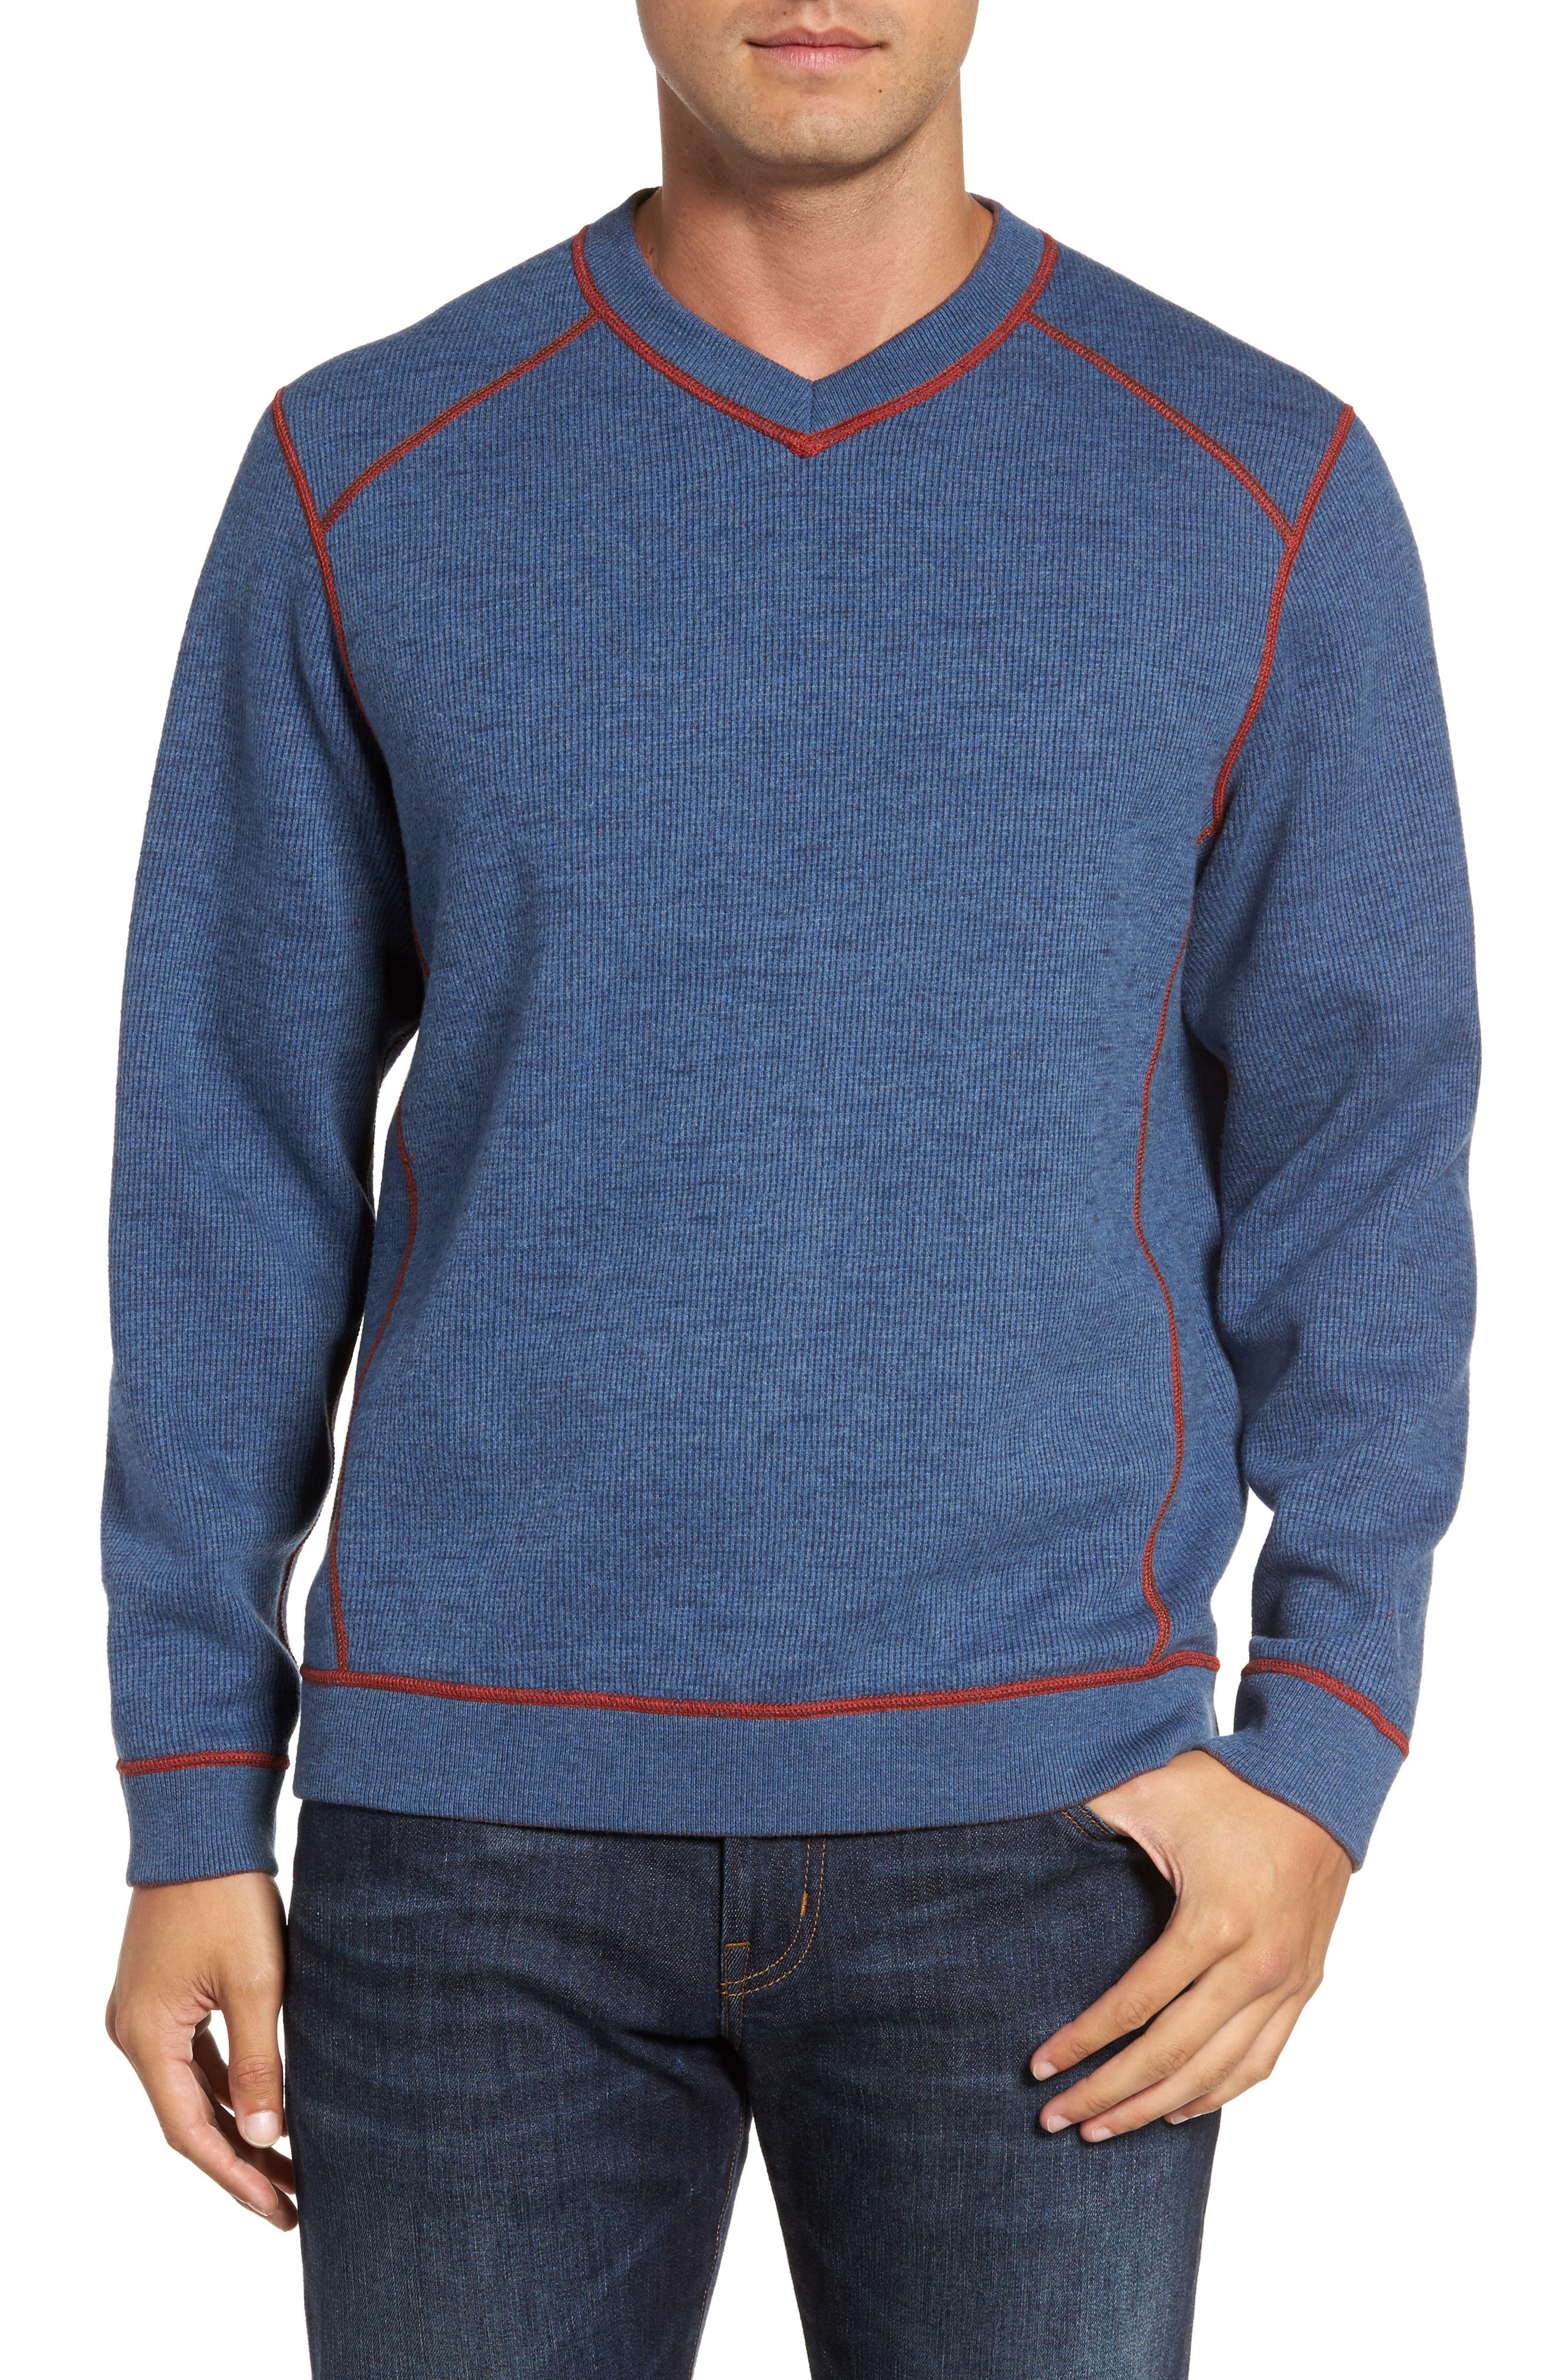 Flipside Pro Reversible Sweatshirt,                             Alternate thumbnail 4, color,                             Pompeya Heather